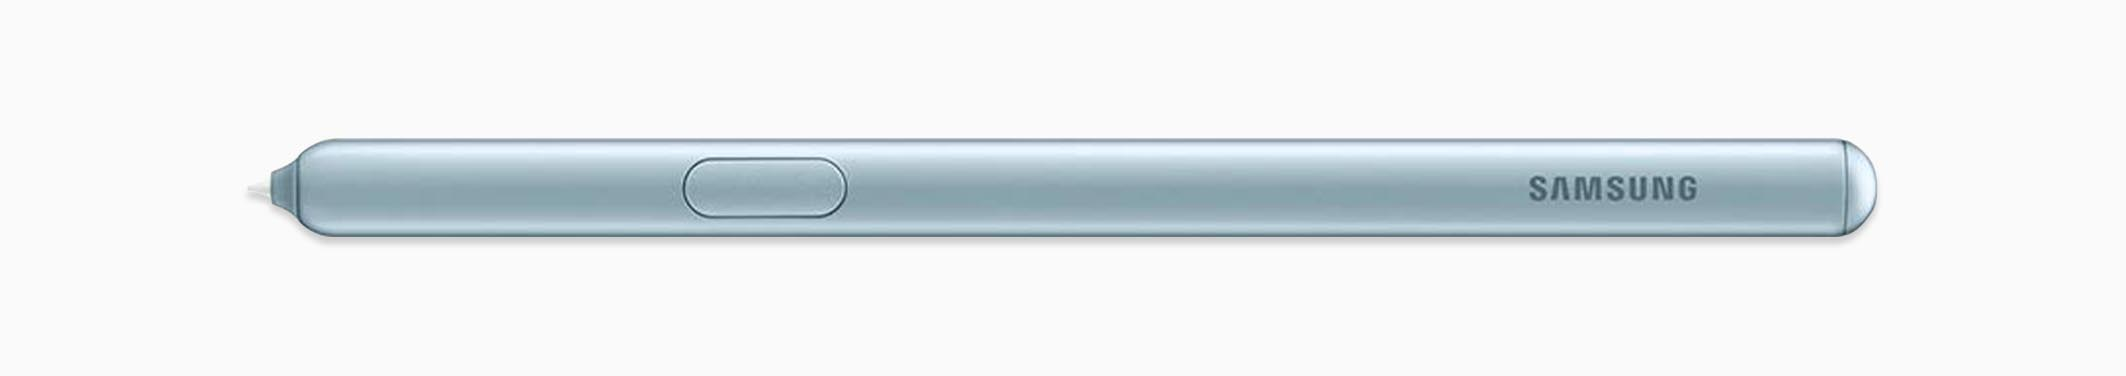 Samsung Galaxy Tab S6 new S Pen